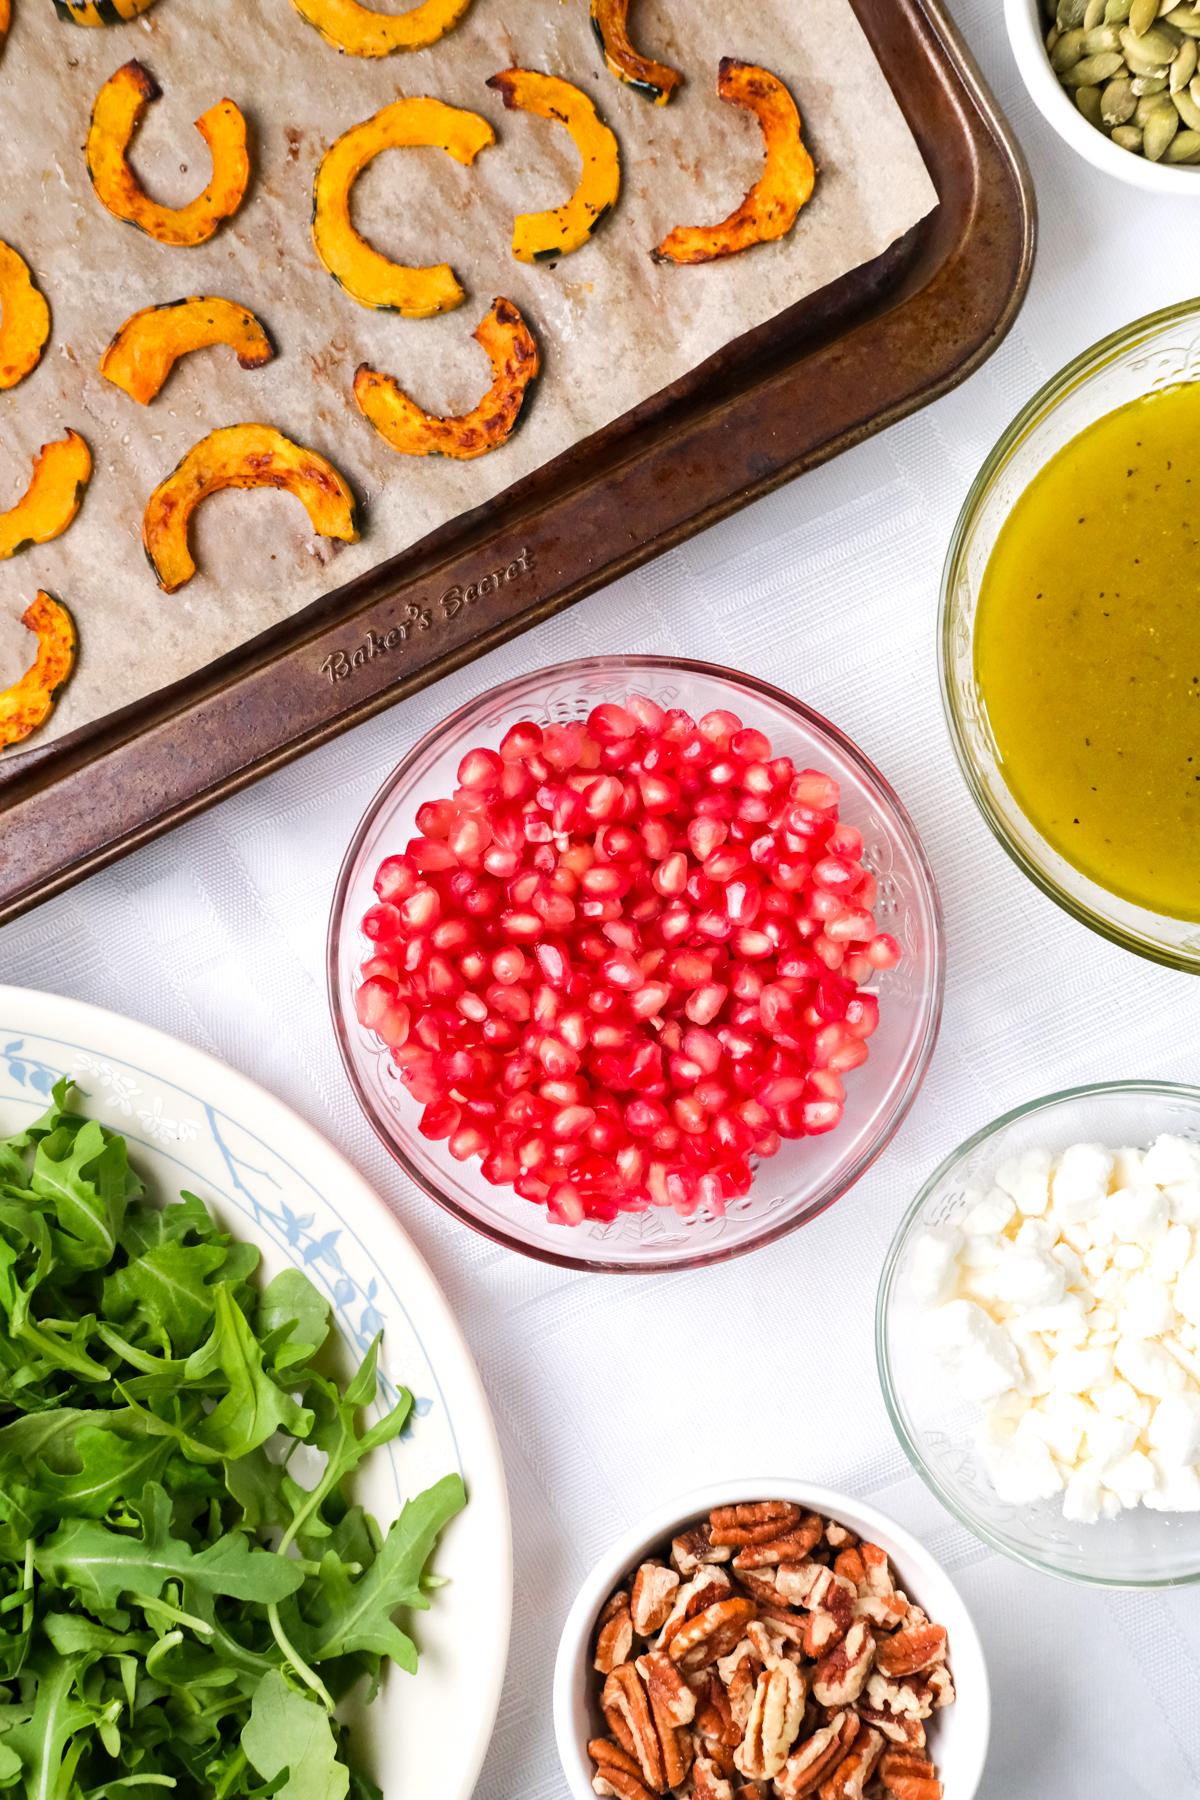 ingredients for a delicata squash salad